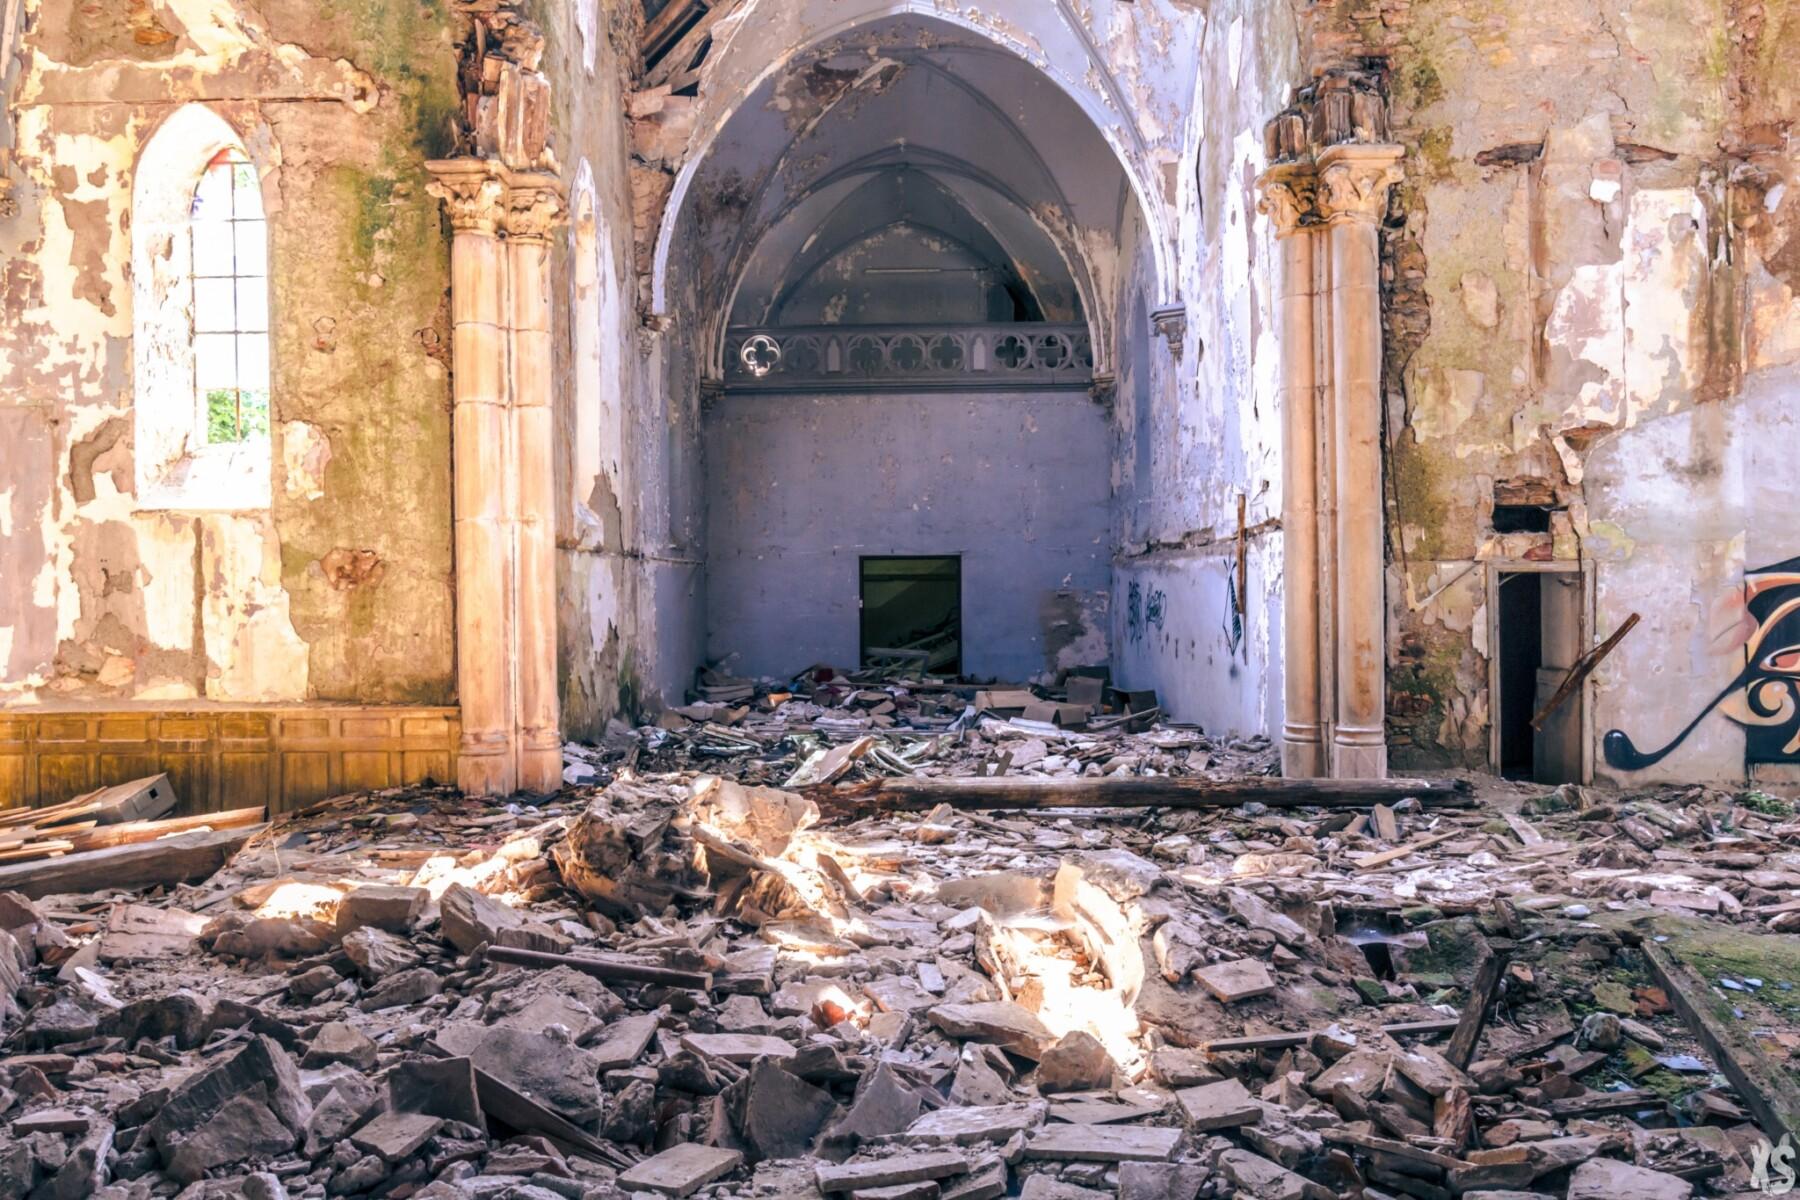 Abandoned school in France | urbexsession.com/en/joseph-vacher-school | Urbex France